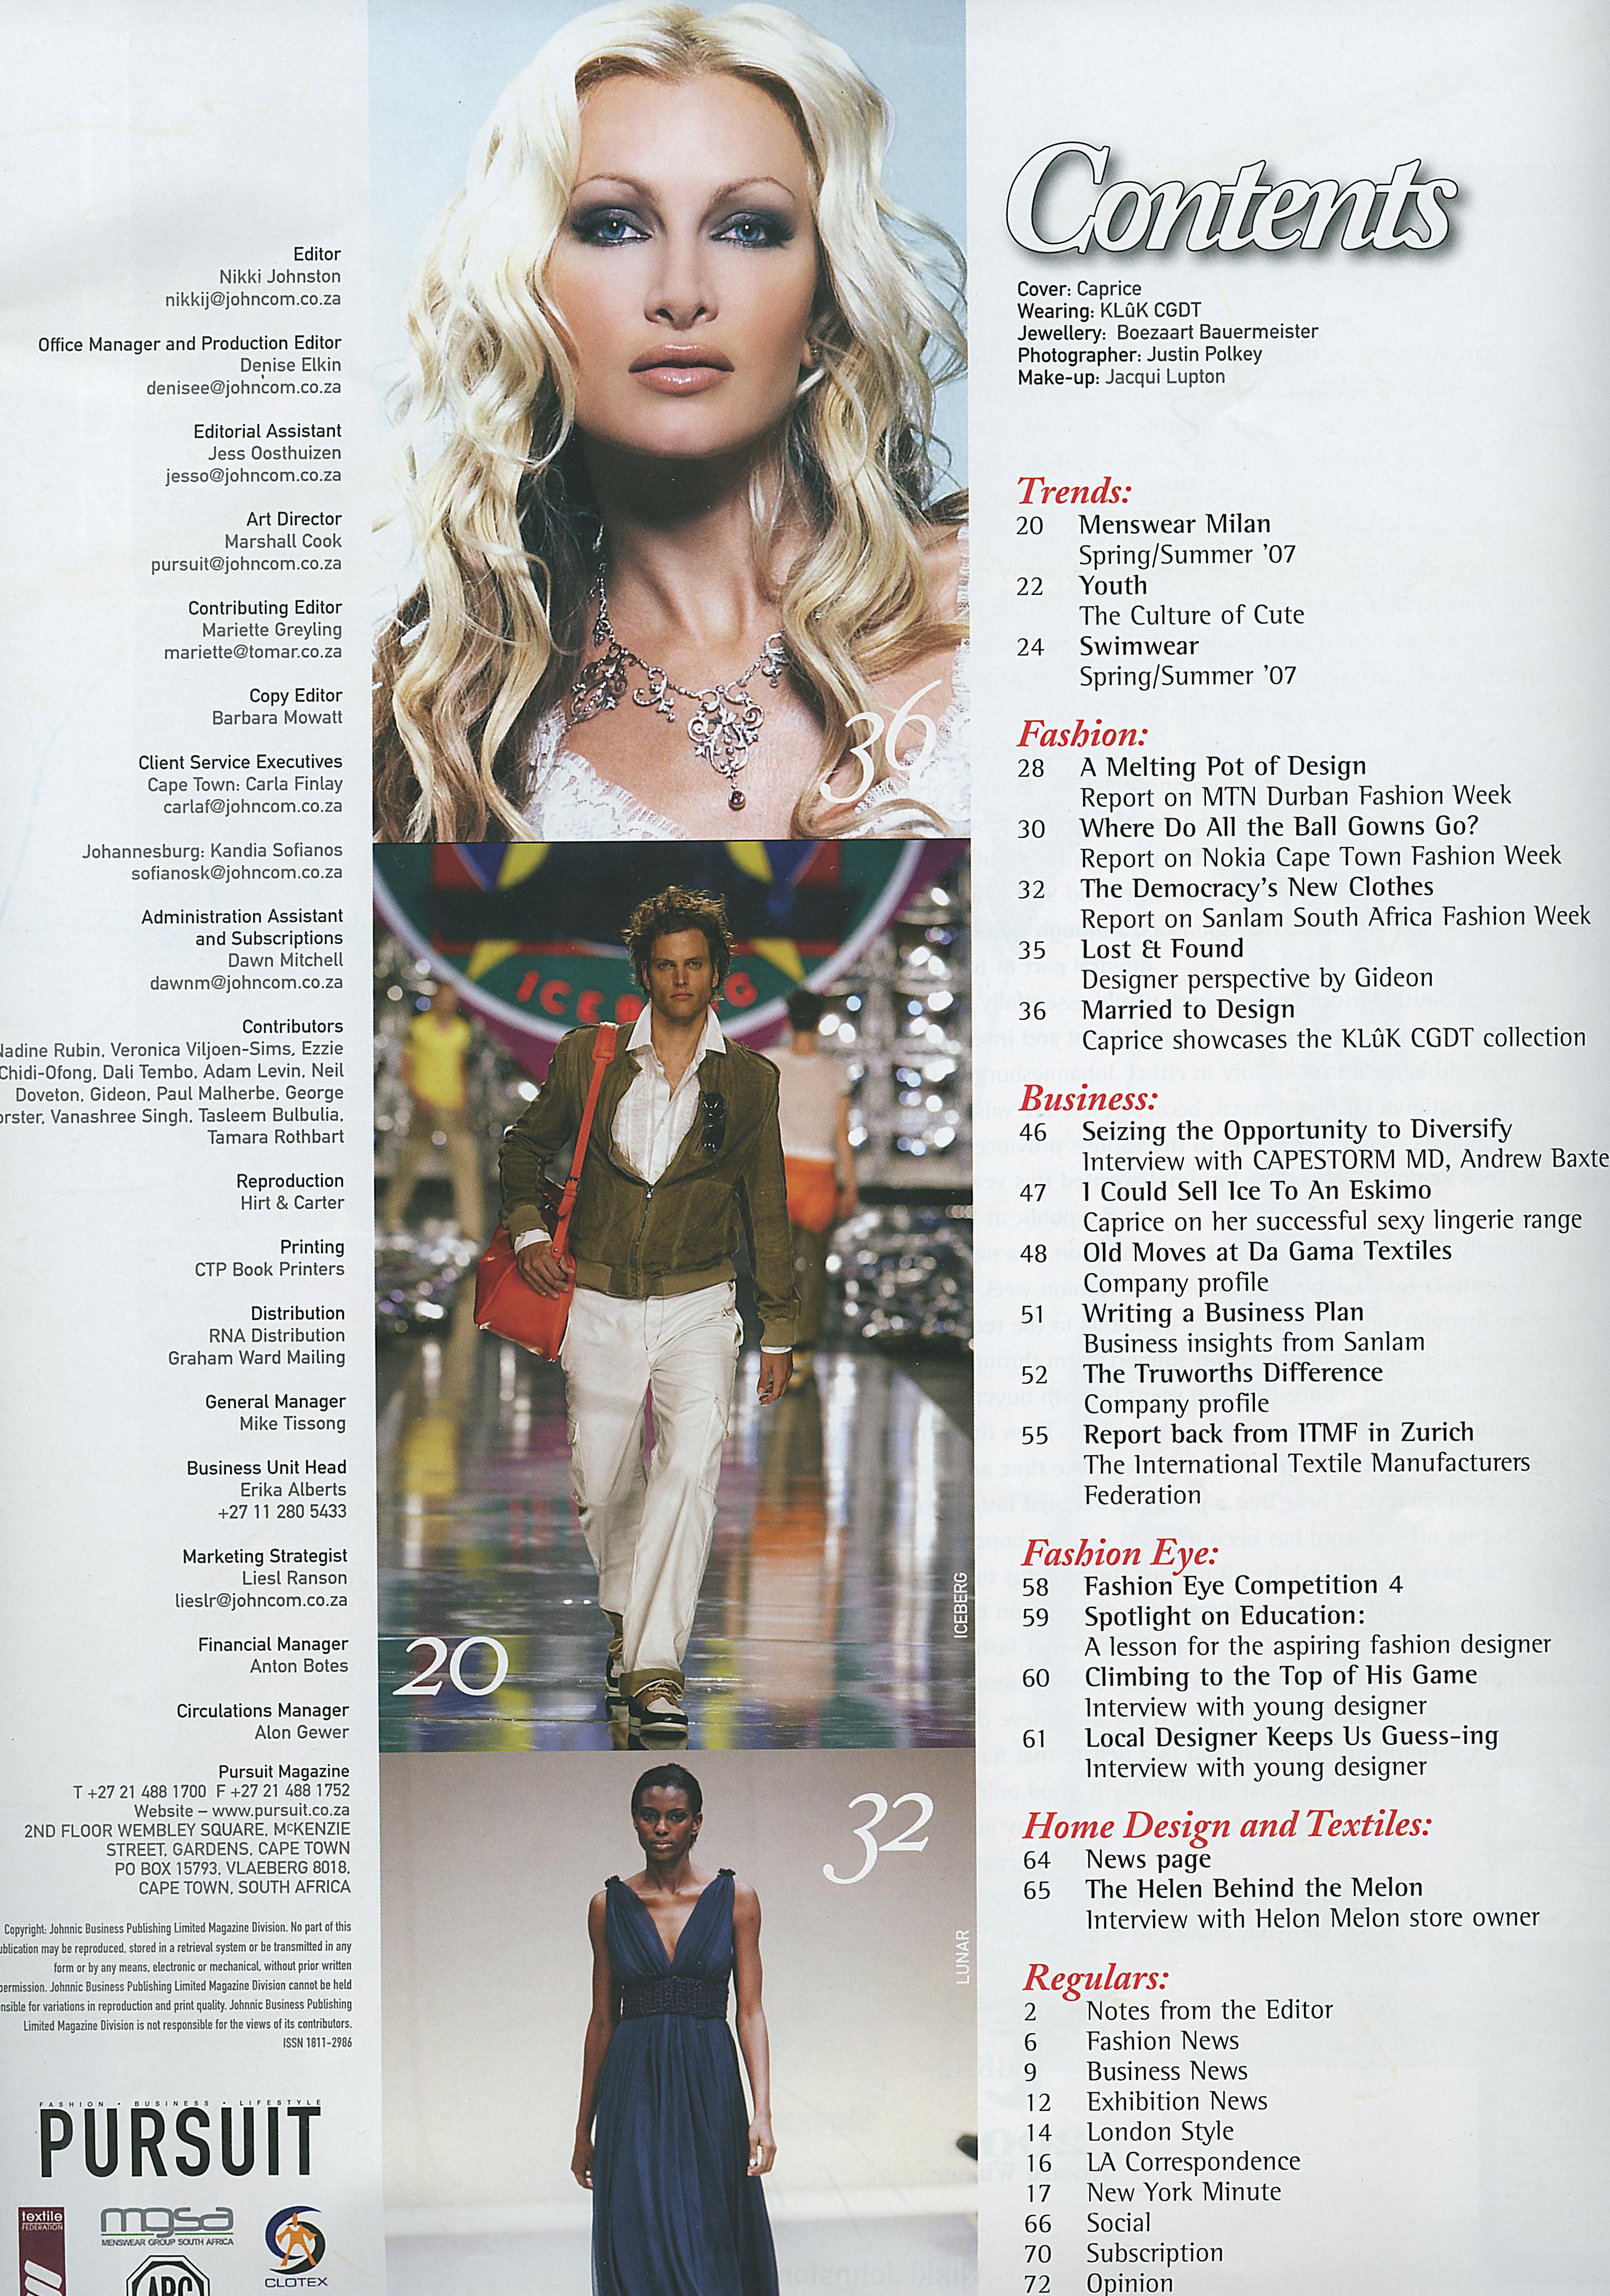 PURSUIT ISSUE 4 2006